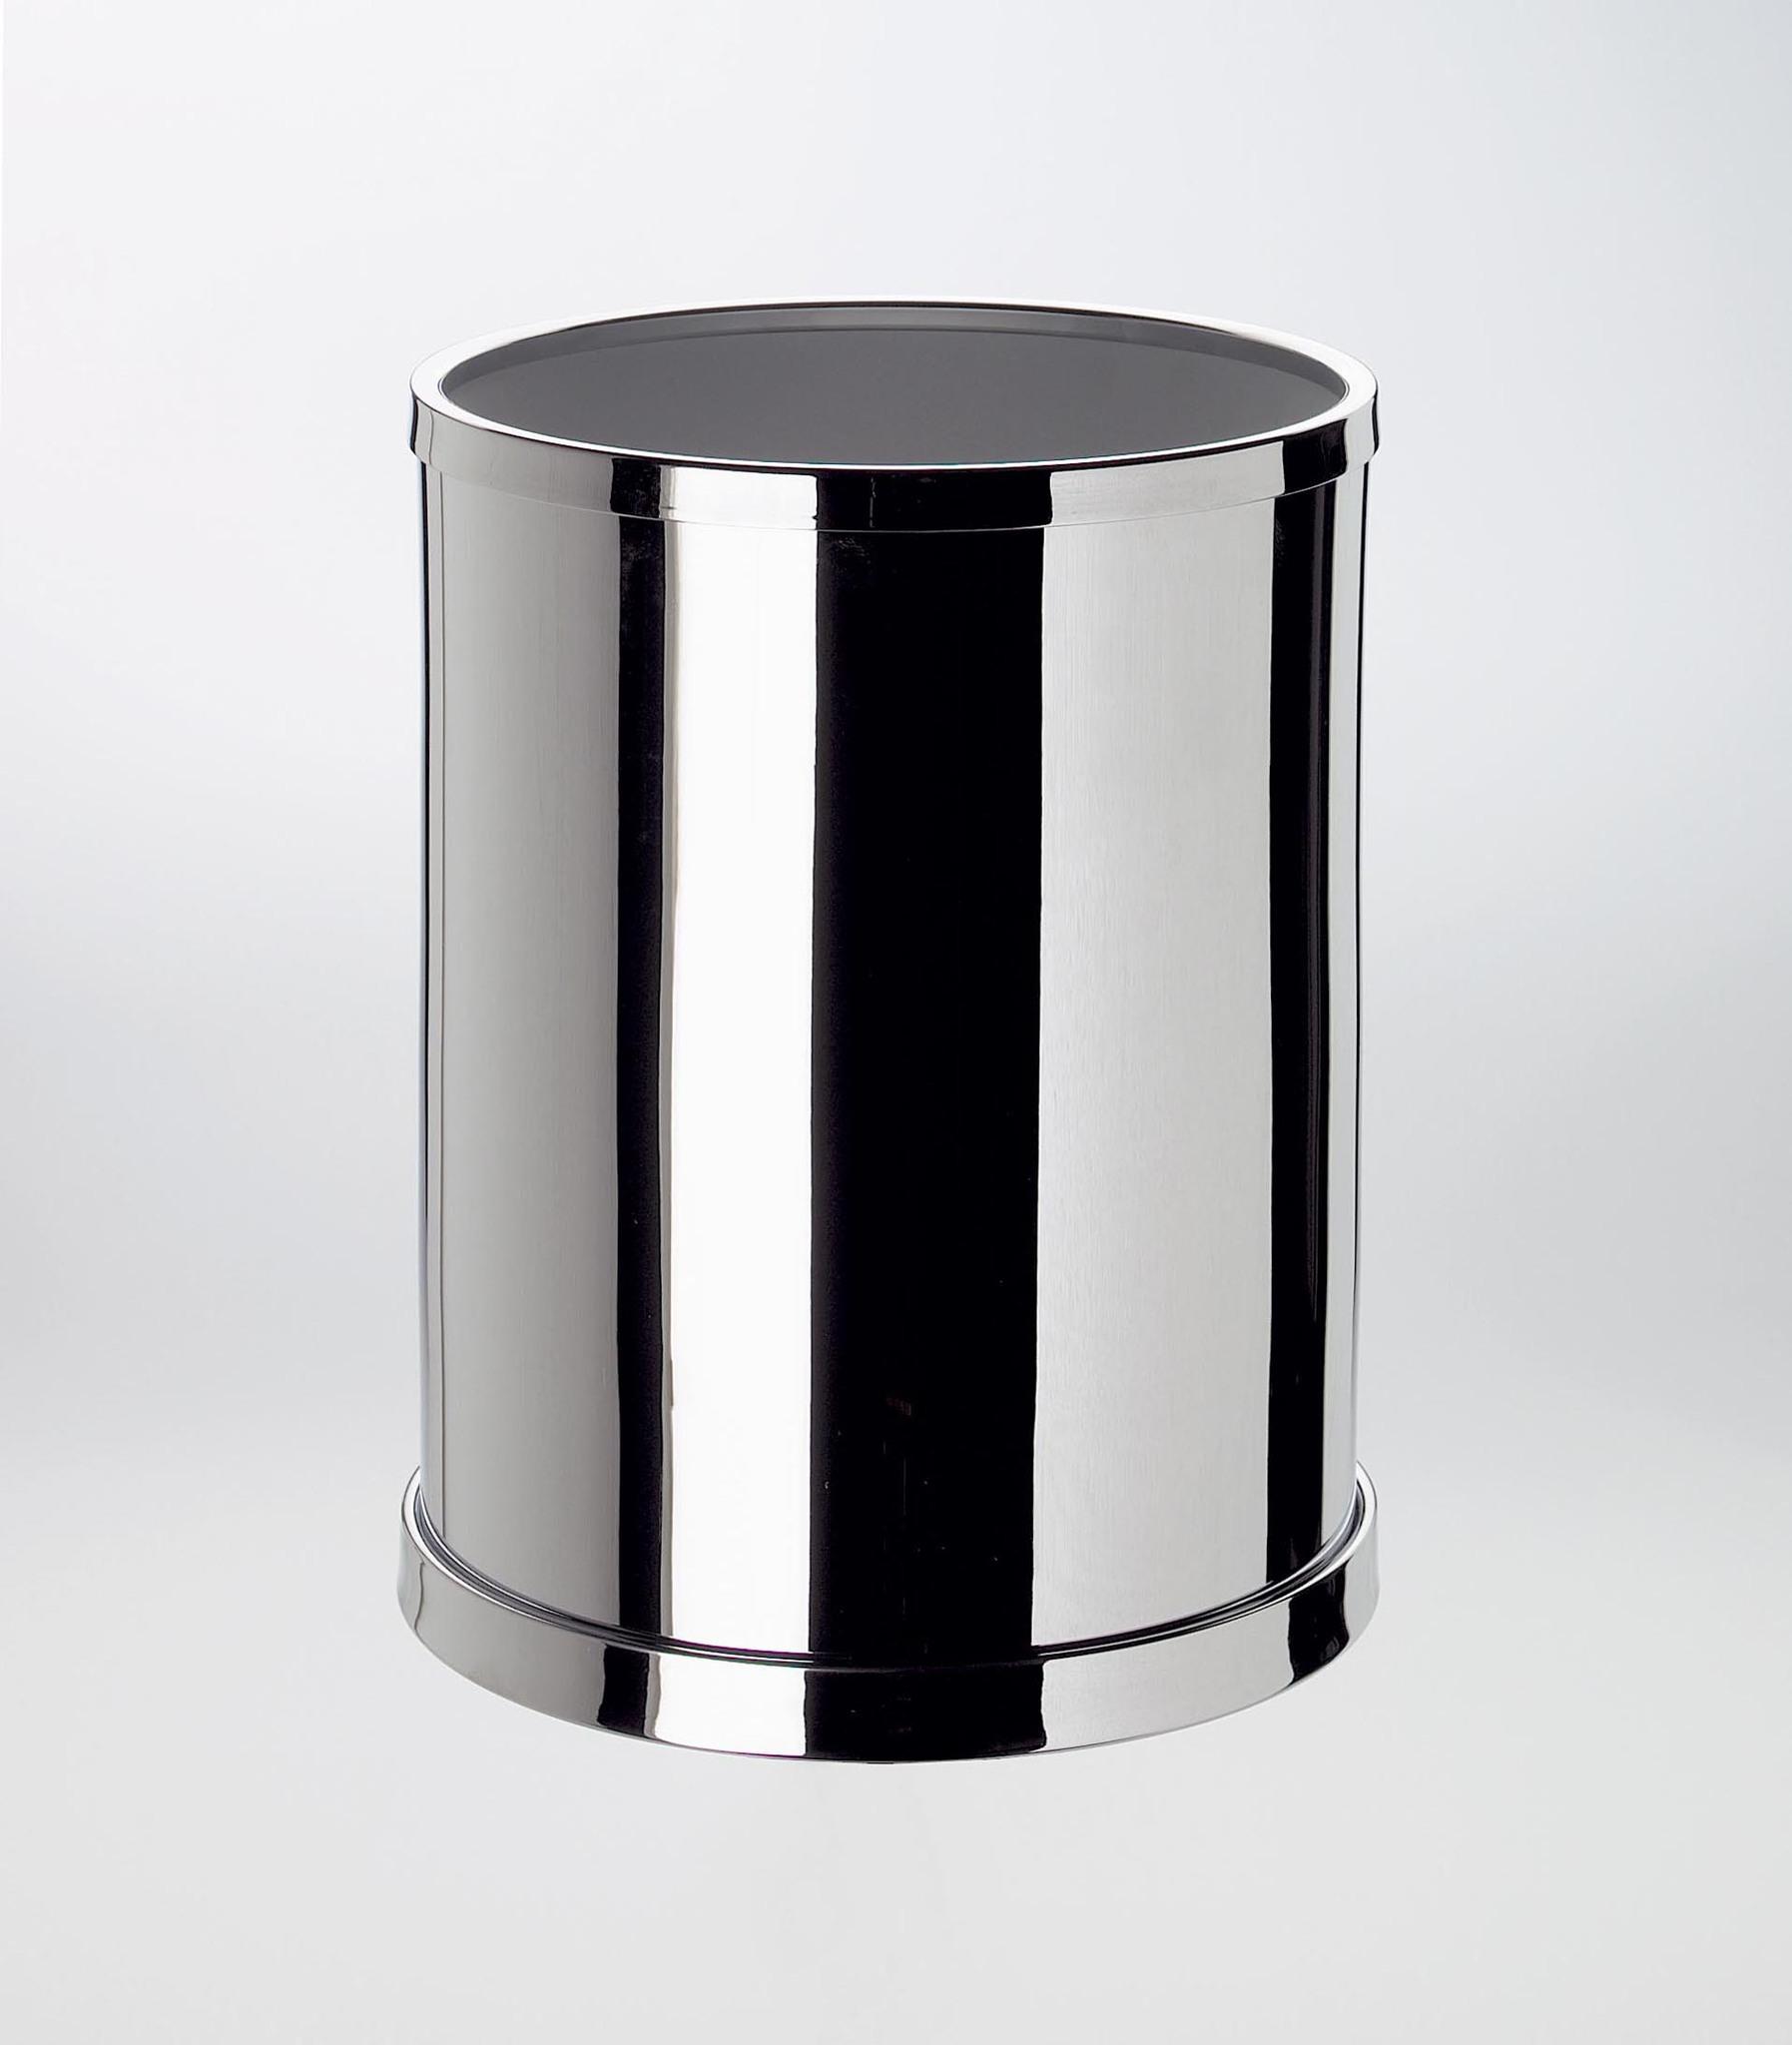 Ведра для мусора Ведро для мусора Windisch 89126CR Plain korzina-dlya-musora-89126-plain-ot-windisch-ispaniya.JPG